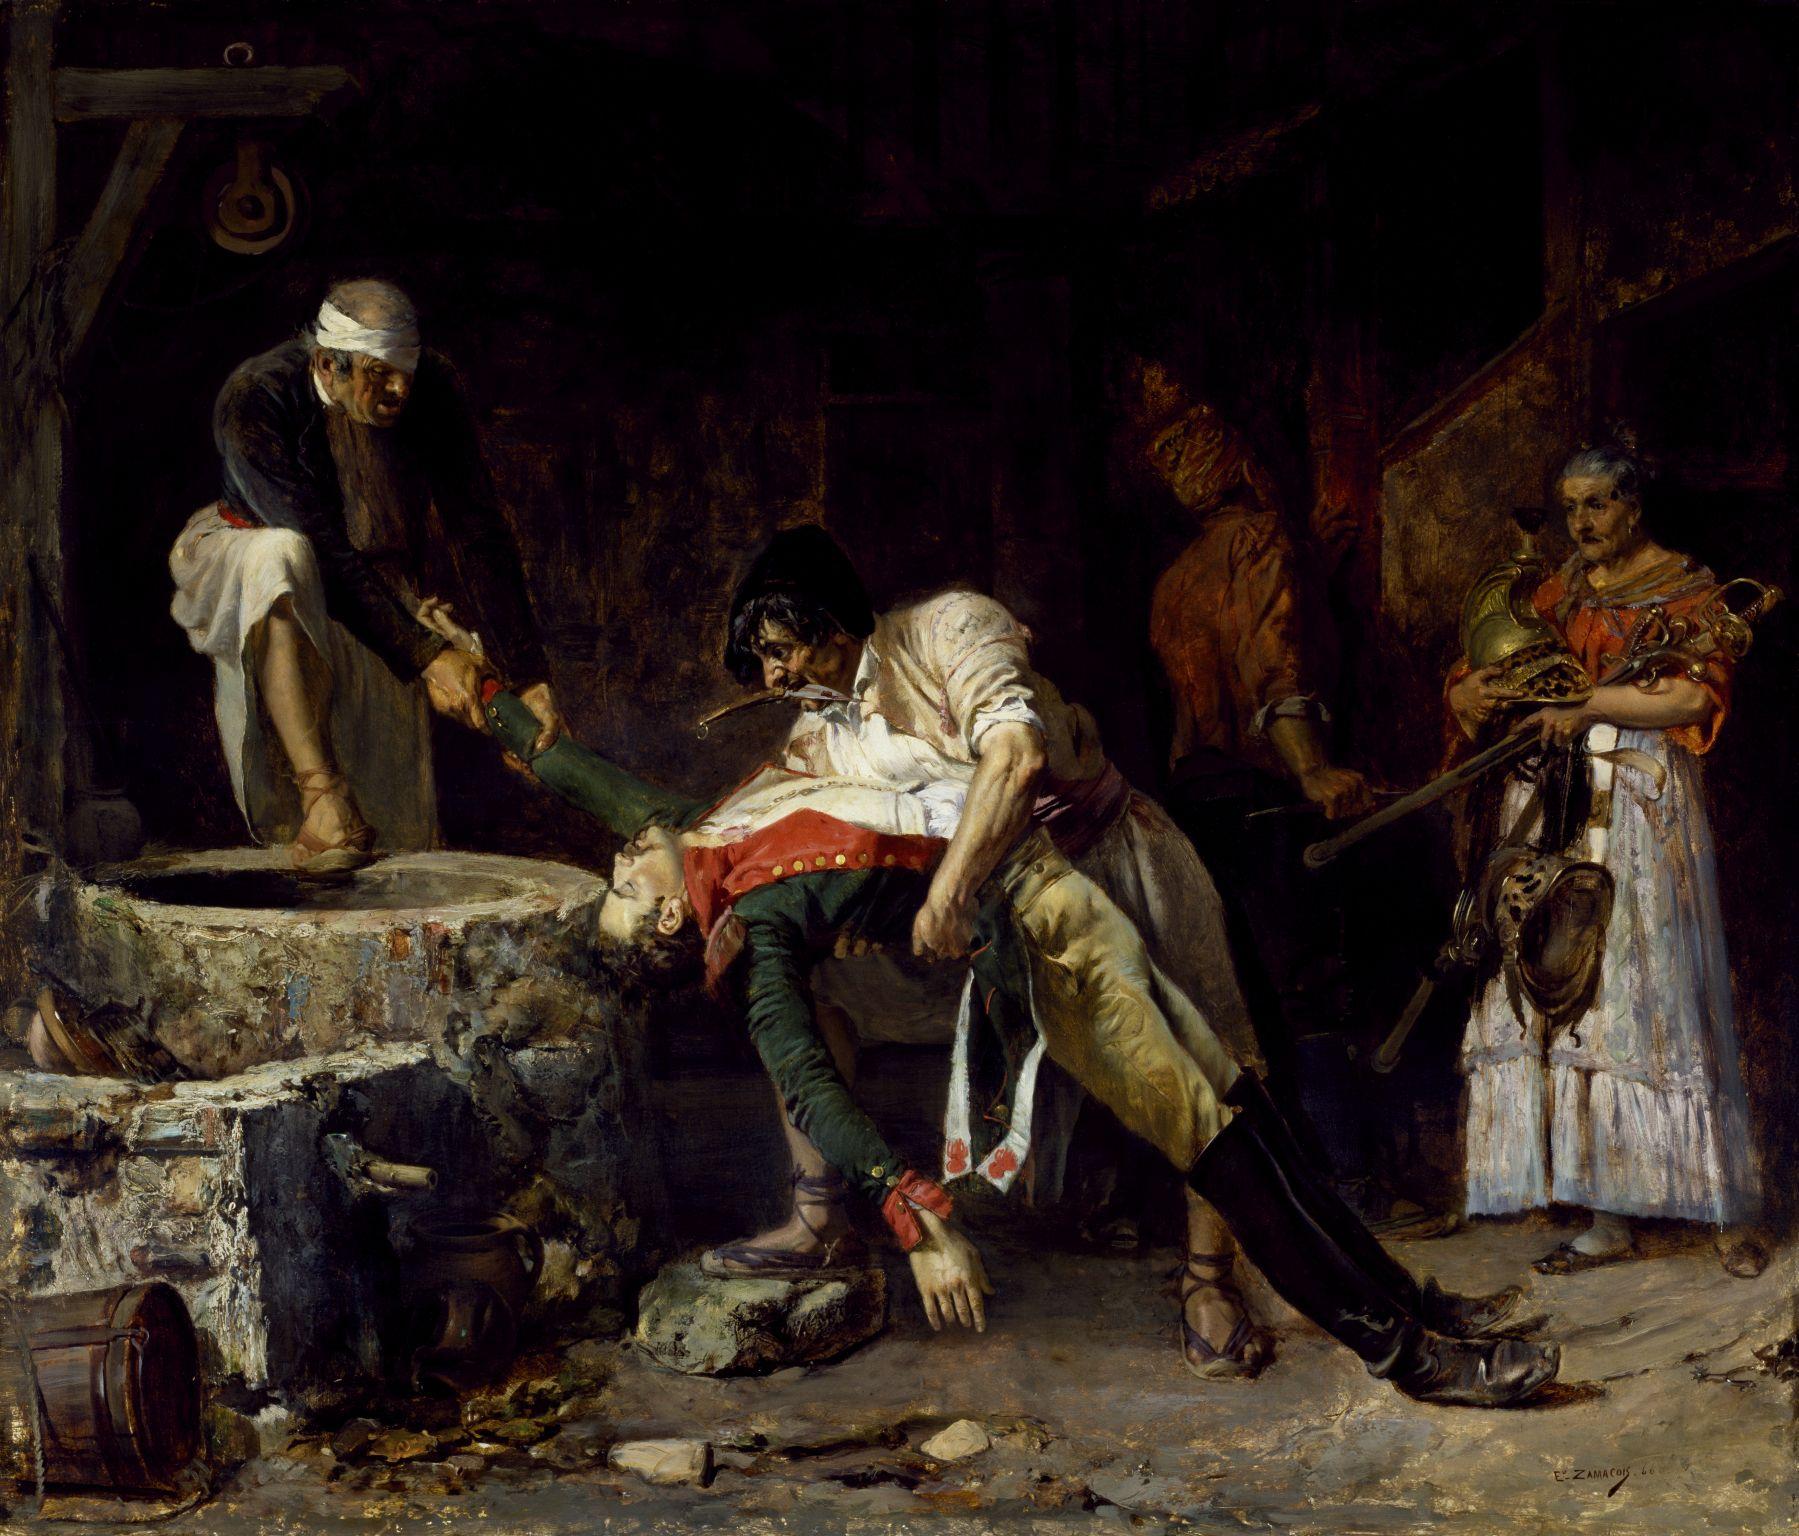 Eduardo Zamacois y Zabela - Spain 1812, French Occupation [1866] Walters Art Museum, Baltimore - Oil on canvas, 44.3 x 52 cm